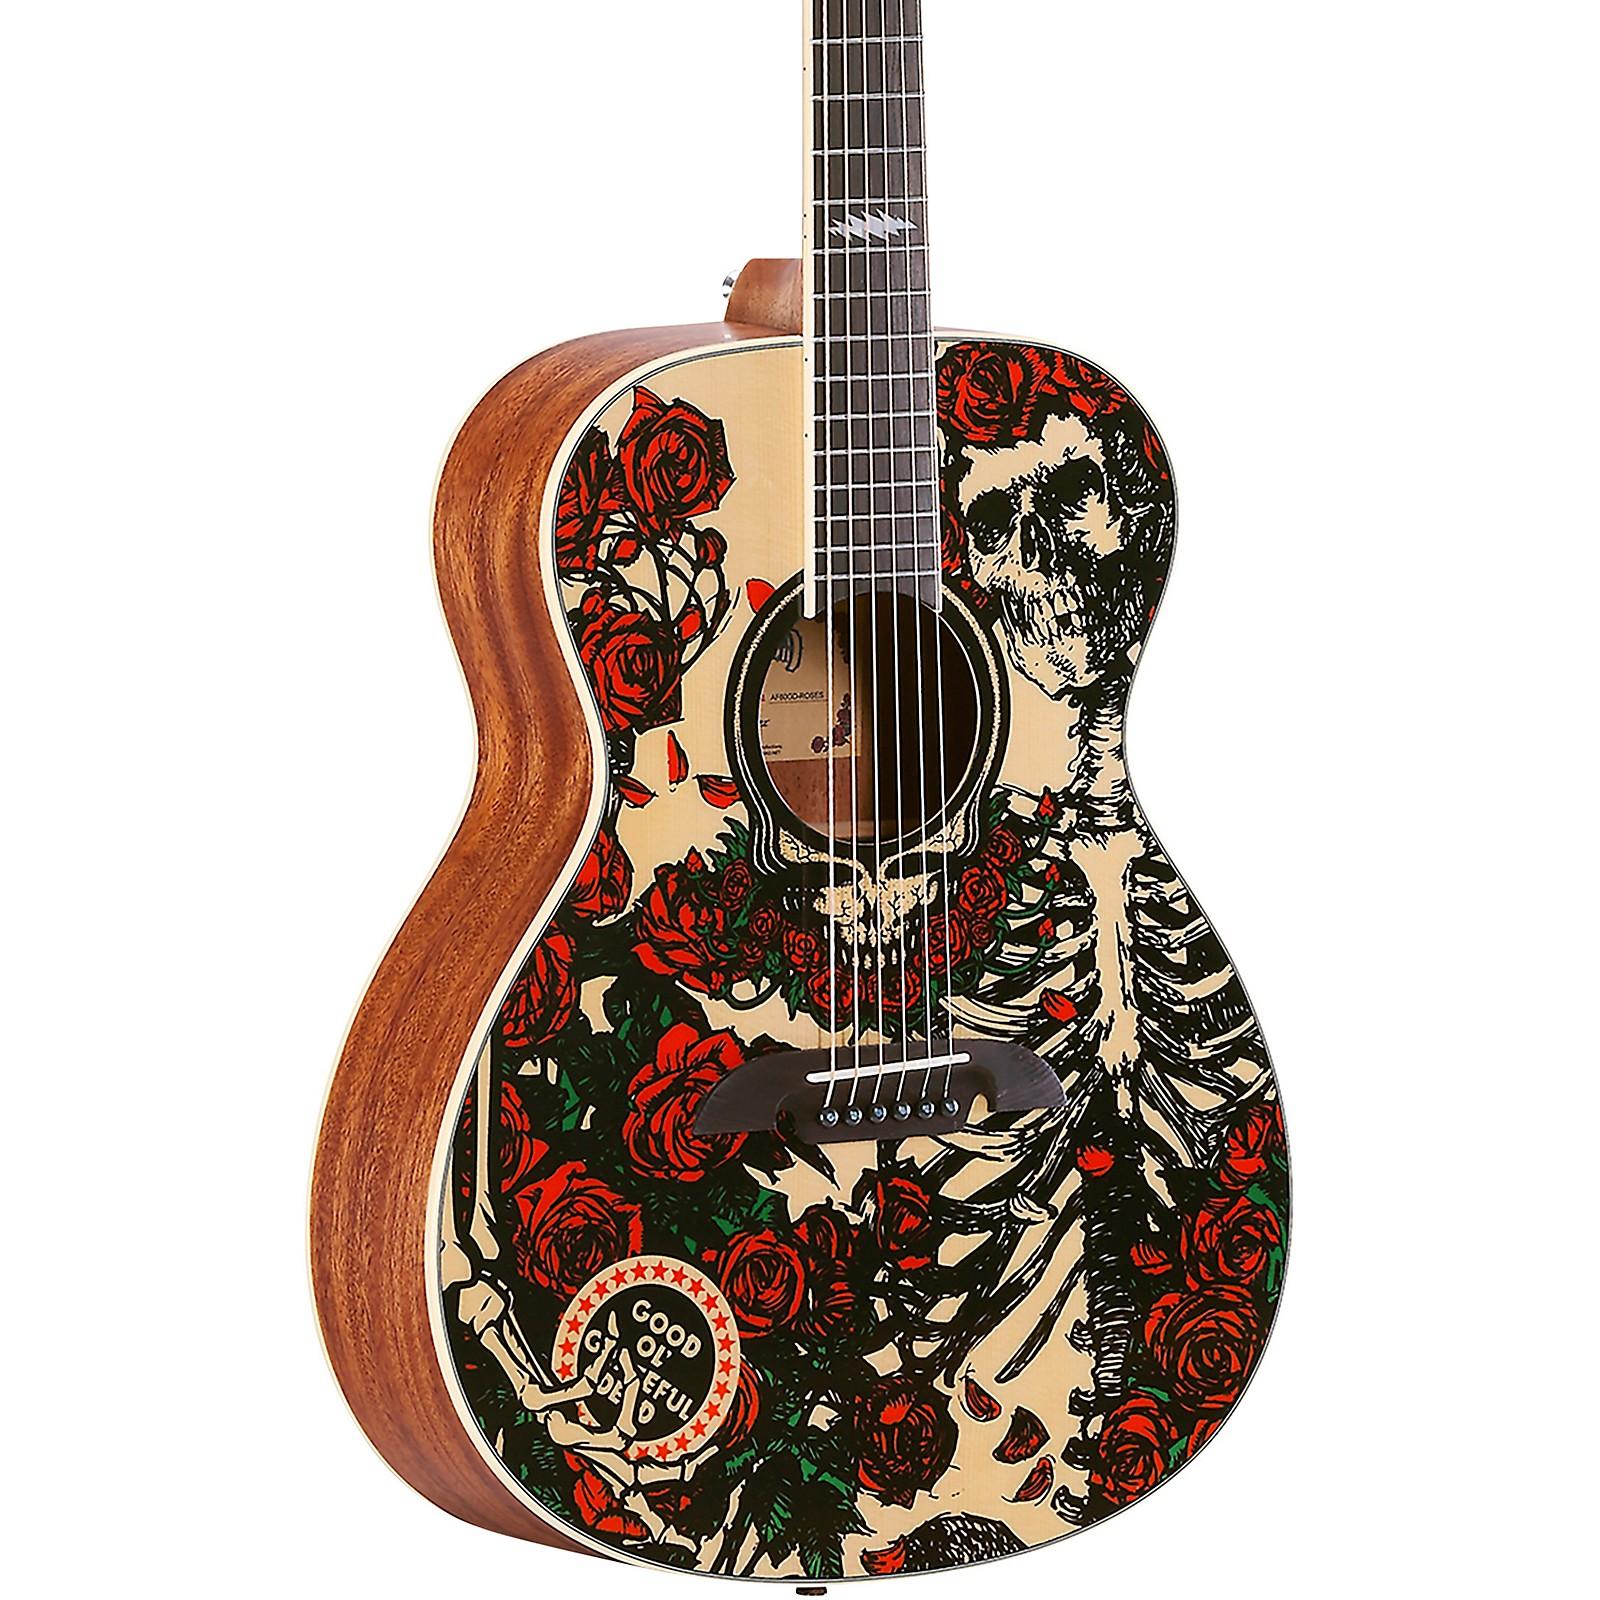 Alvarez Grateful Dead OM Acoustic Guitar